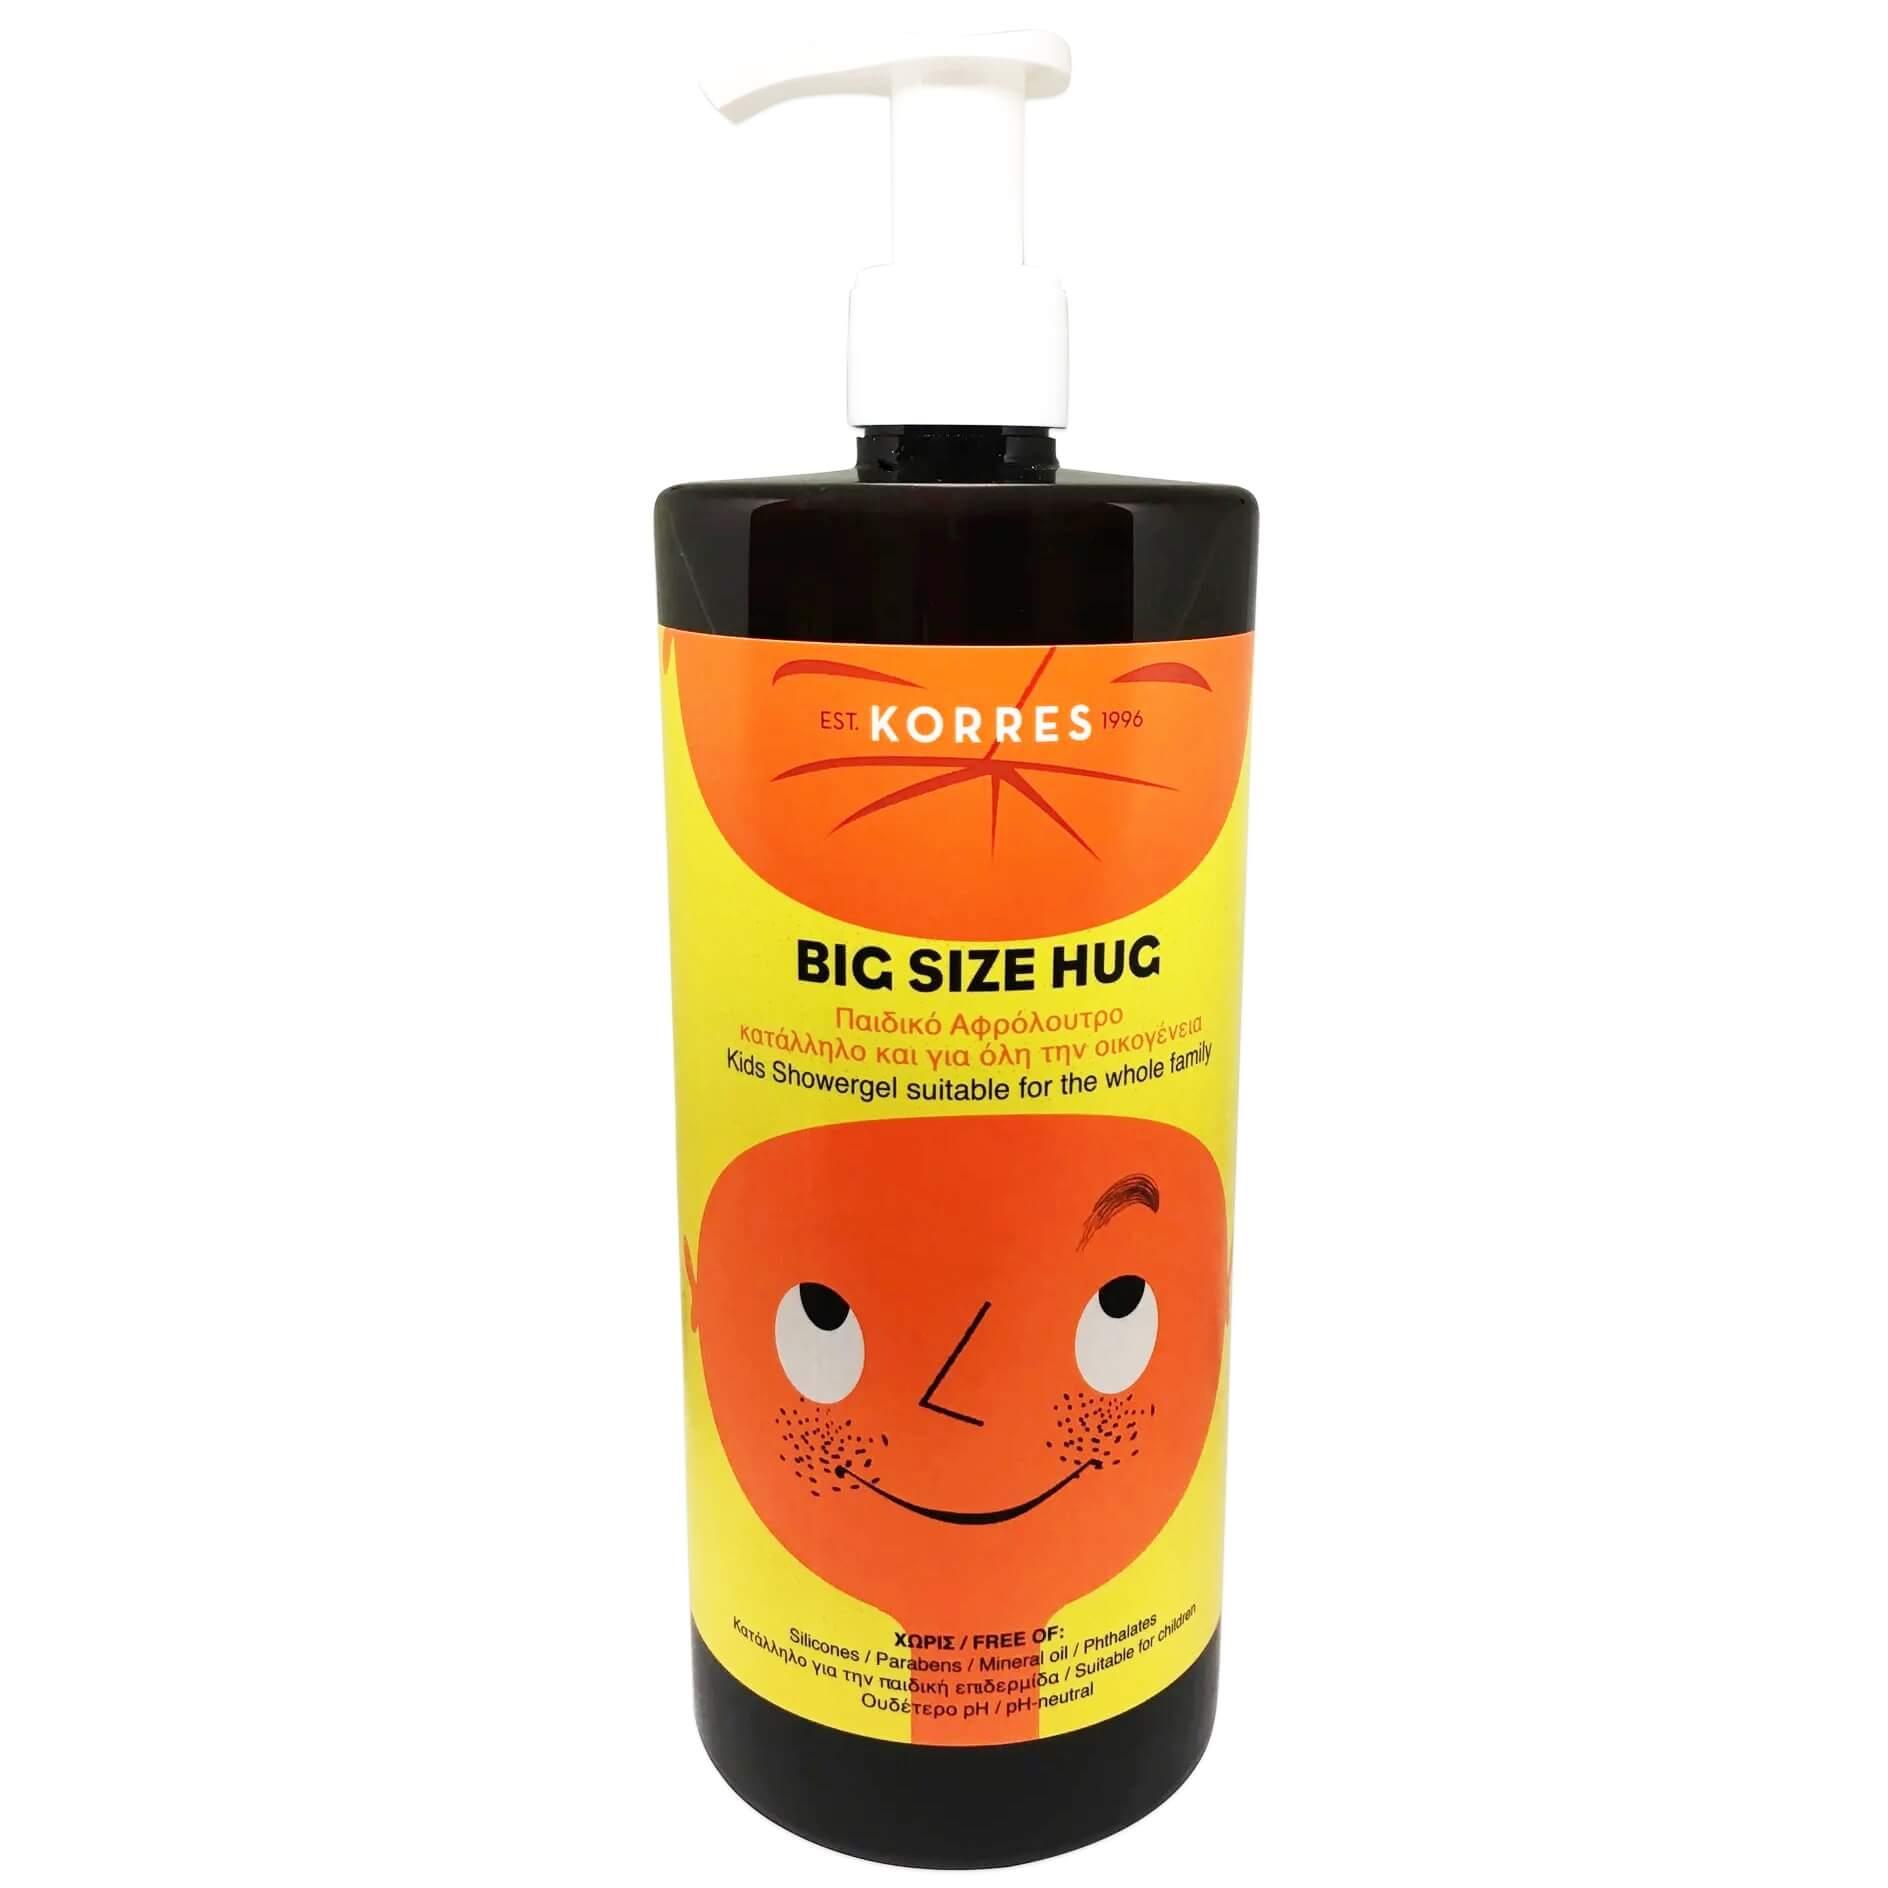 Korres Big Size Hug Kids Showergel Παιδικό Αφρόλουτρο, Κατάλληλο για Όλη την Οικογένεια 1L